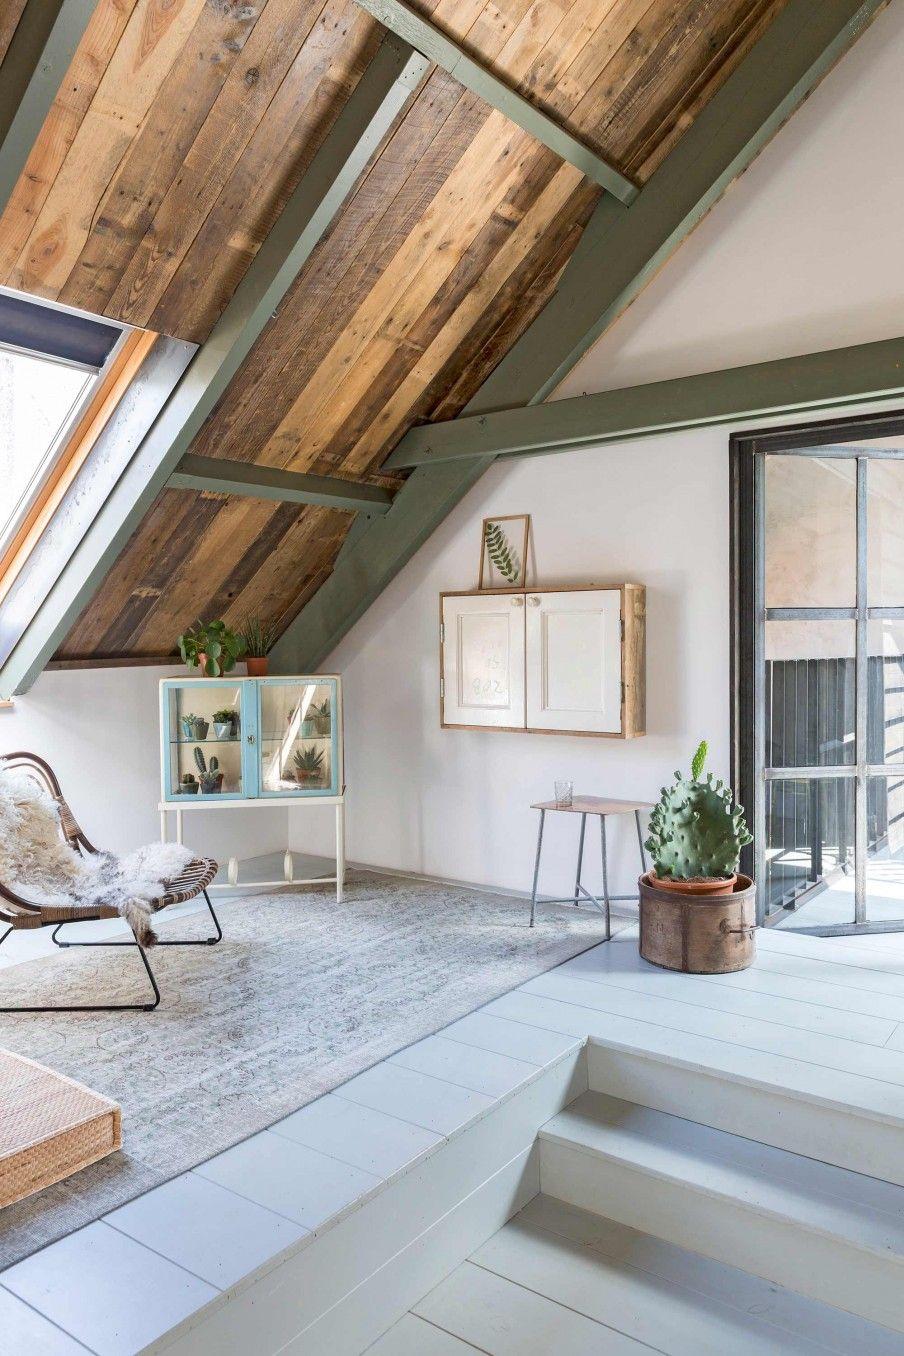 Houten plafond van sloophout in slaapkamer | Wooden ceiling made of ...